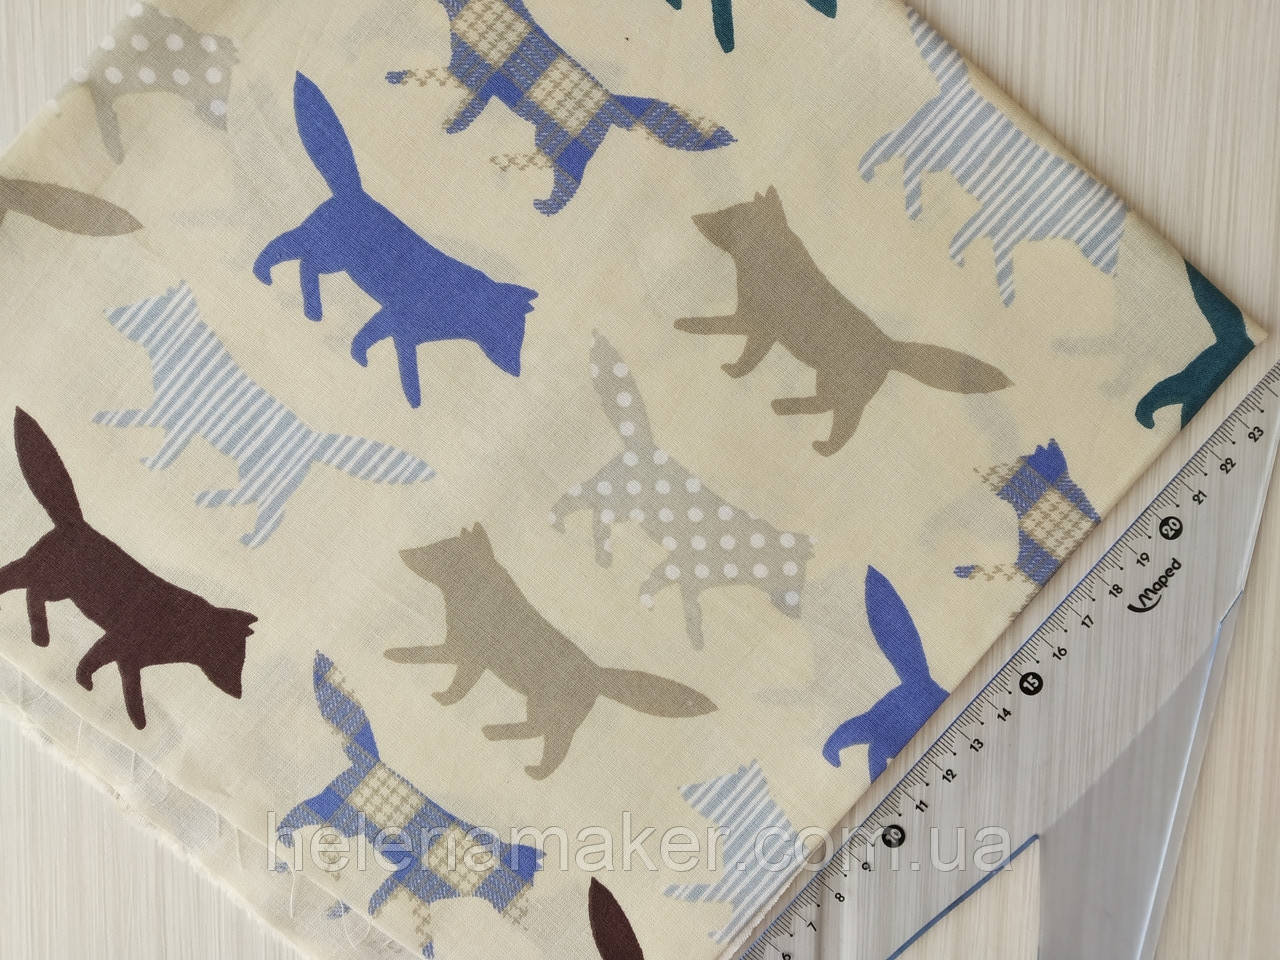 Хлопковая ткань Волки на бежевом фоне. Размер отреза 45*50 см